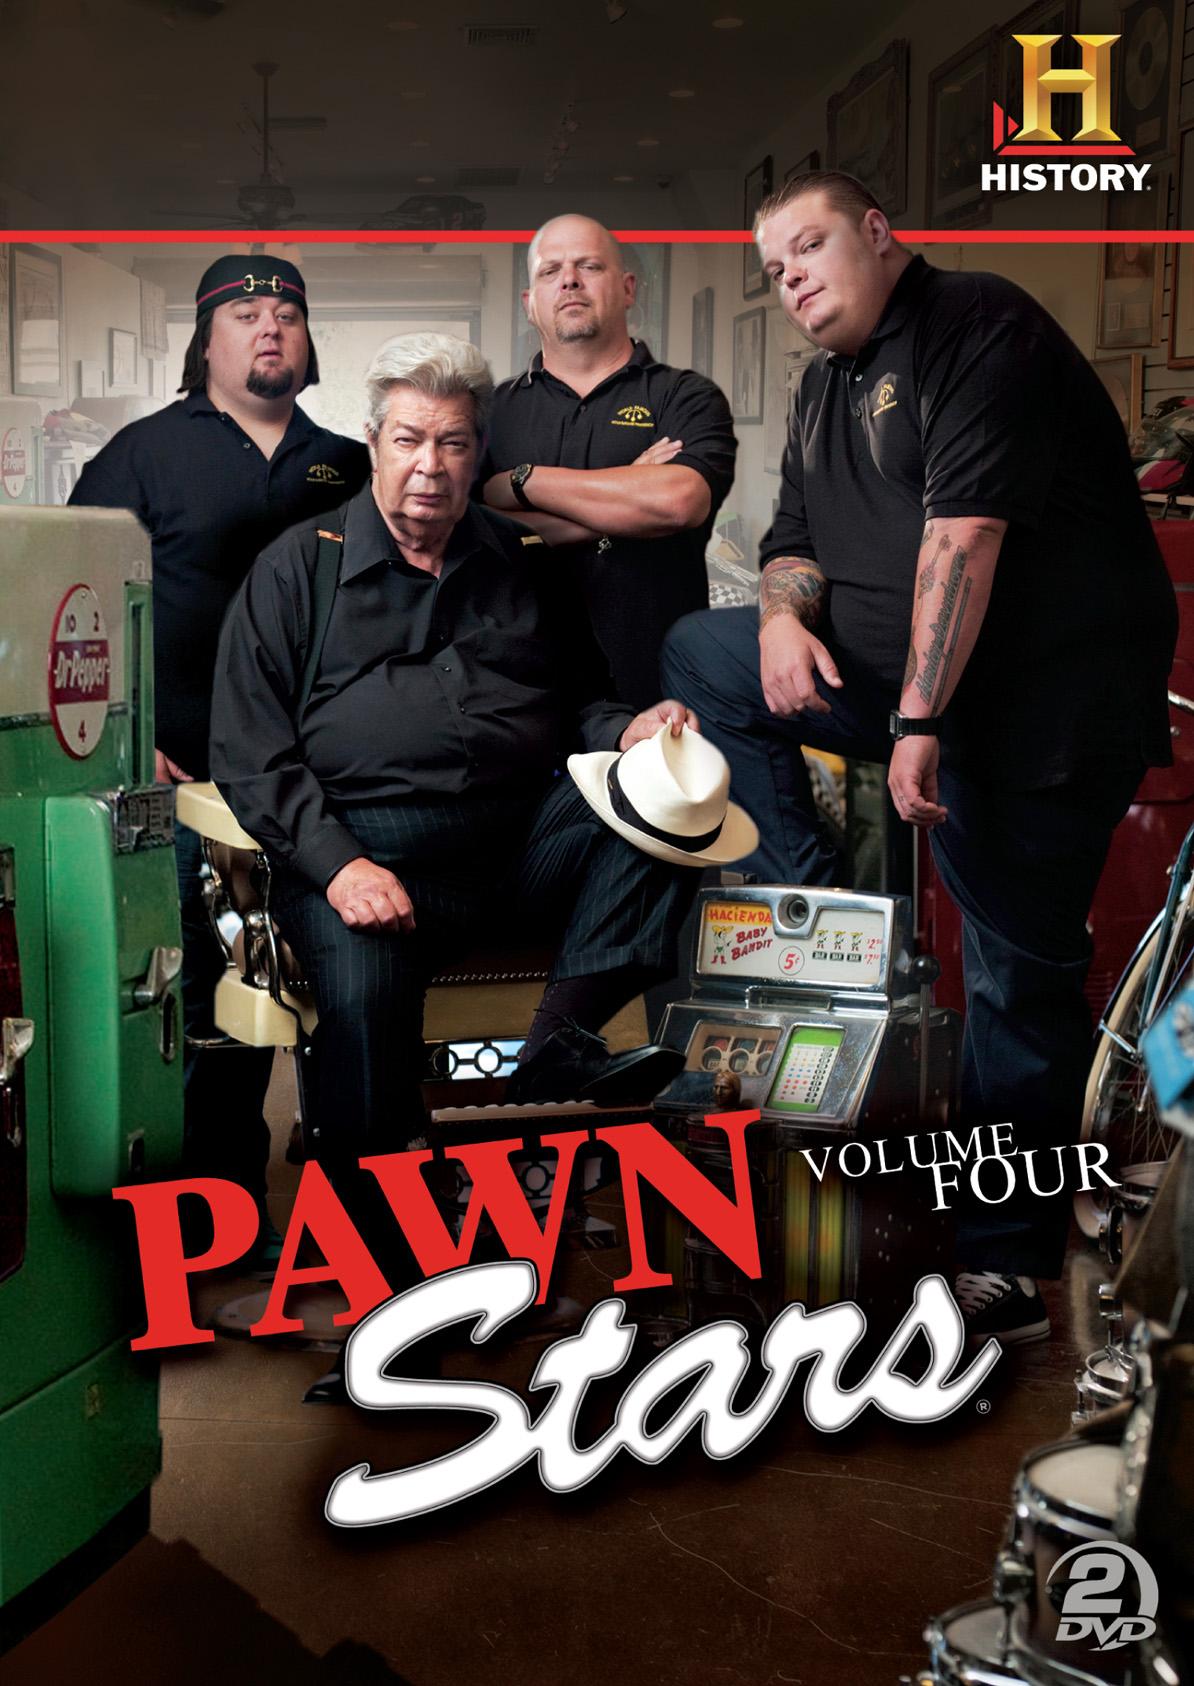 Pawn Stars: Season 4